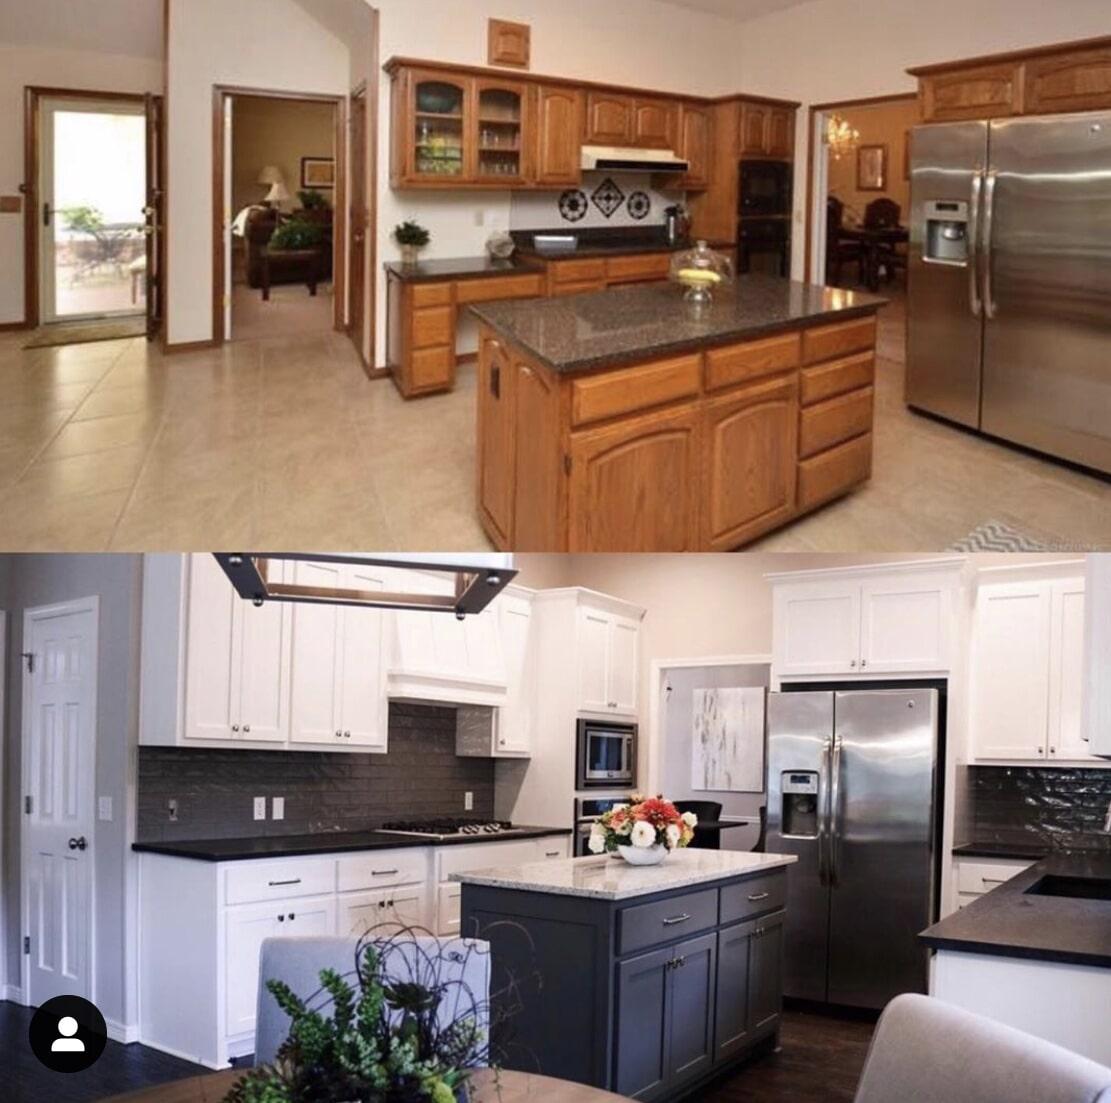 Kitchen remodel in Jenks, OK from Superior Wood Floors & Tile